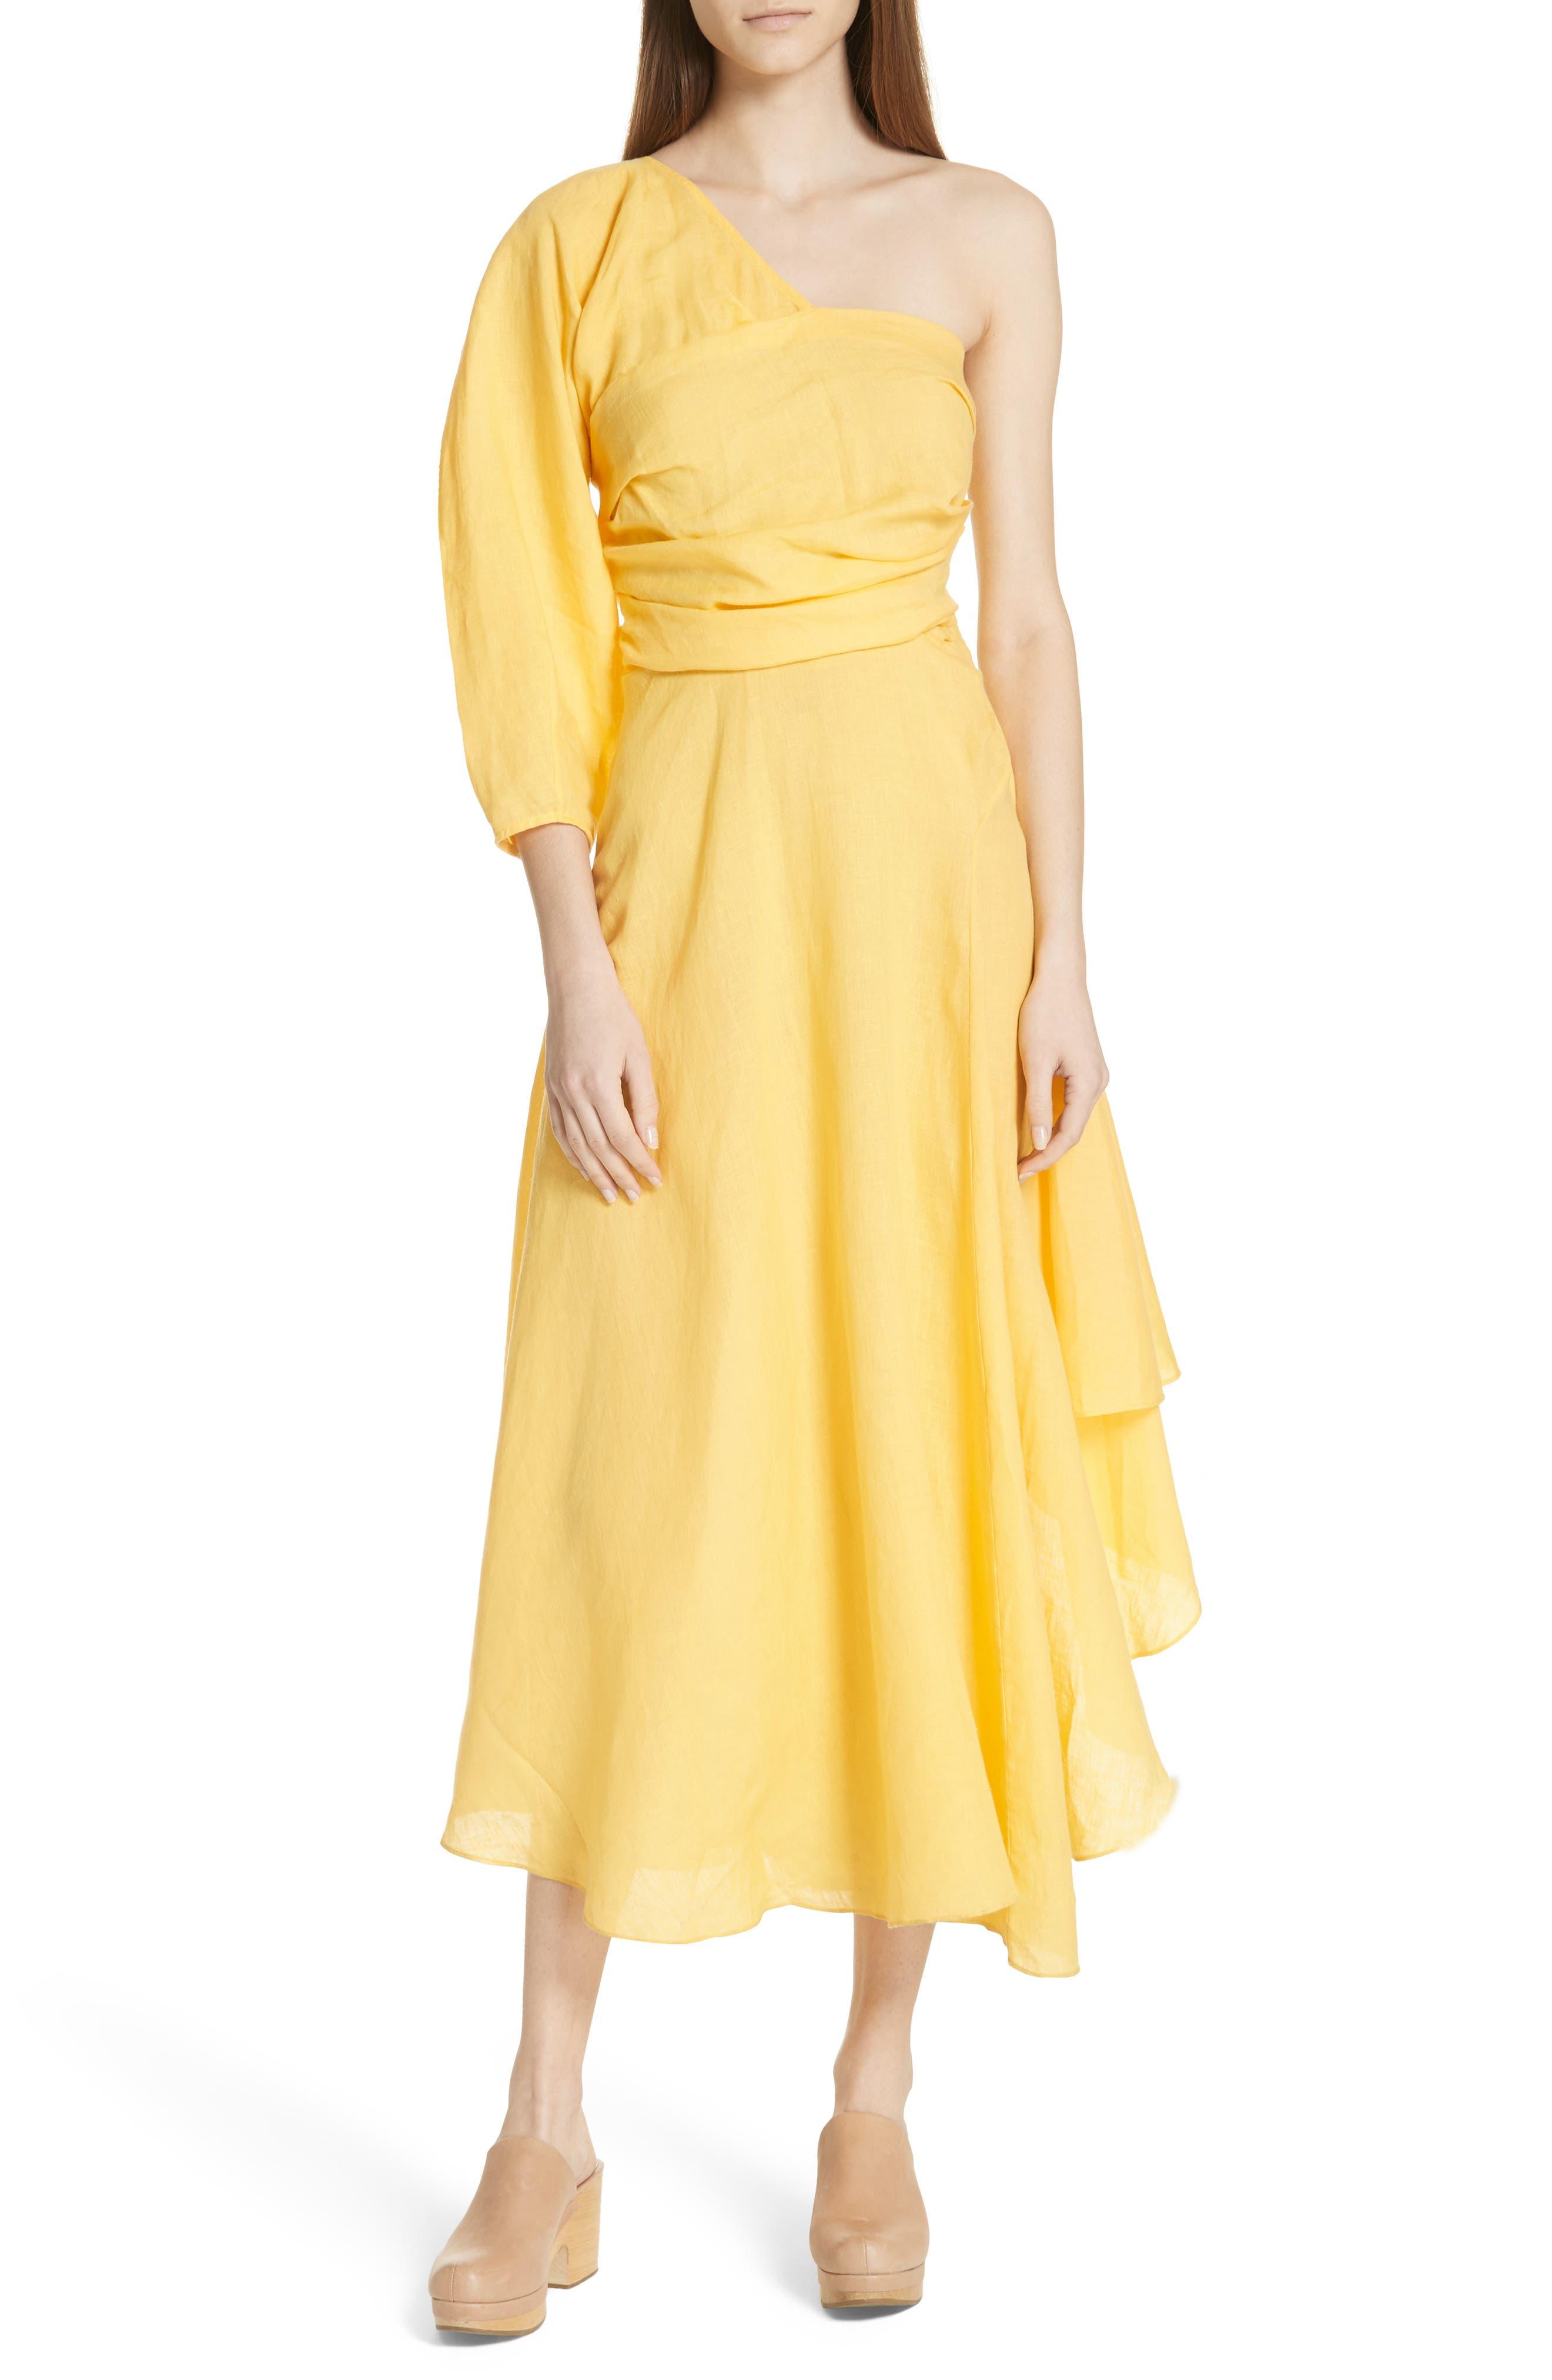 Tipple One-Shoulder Dress,                             Main thumbnail 1, color,                             770